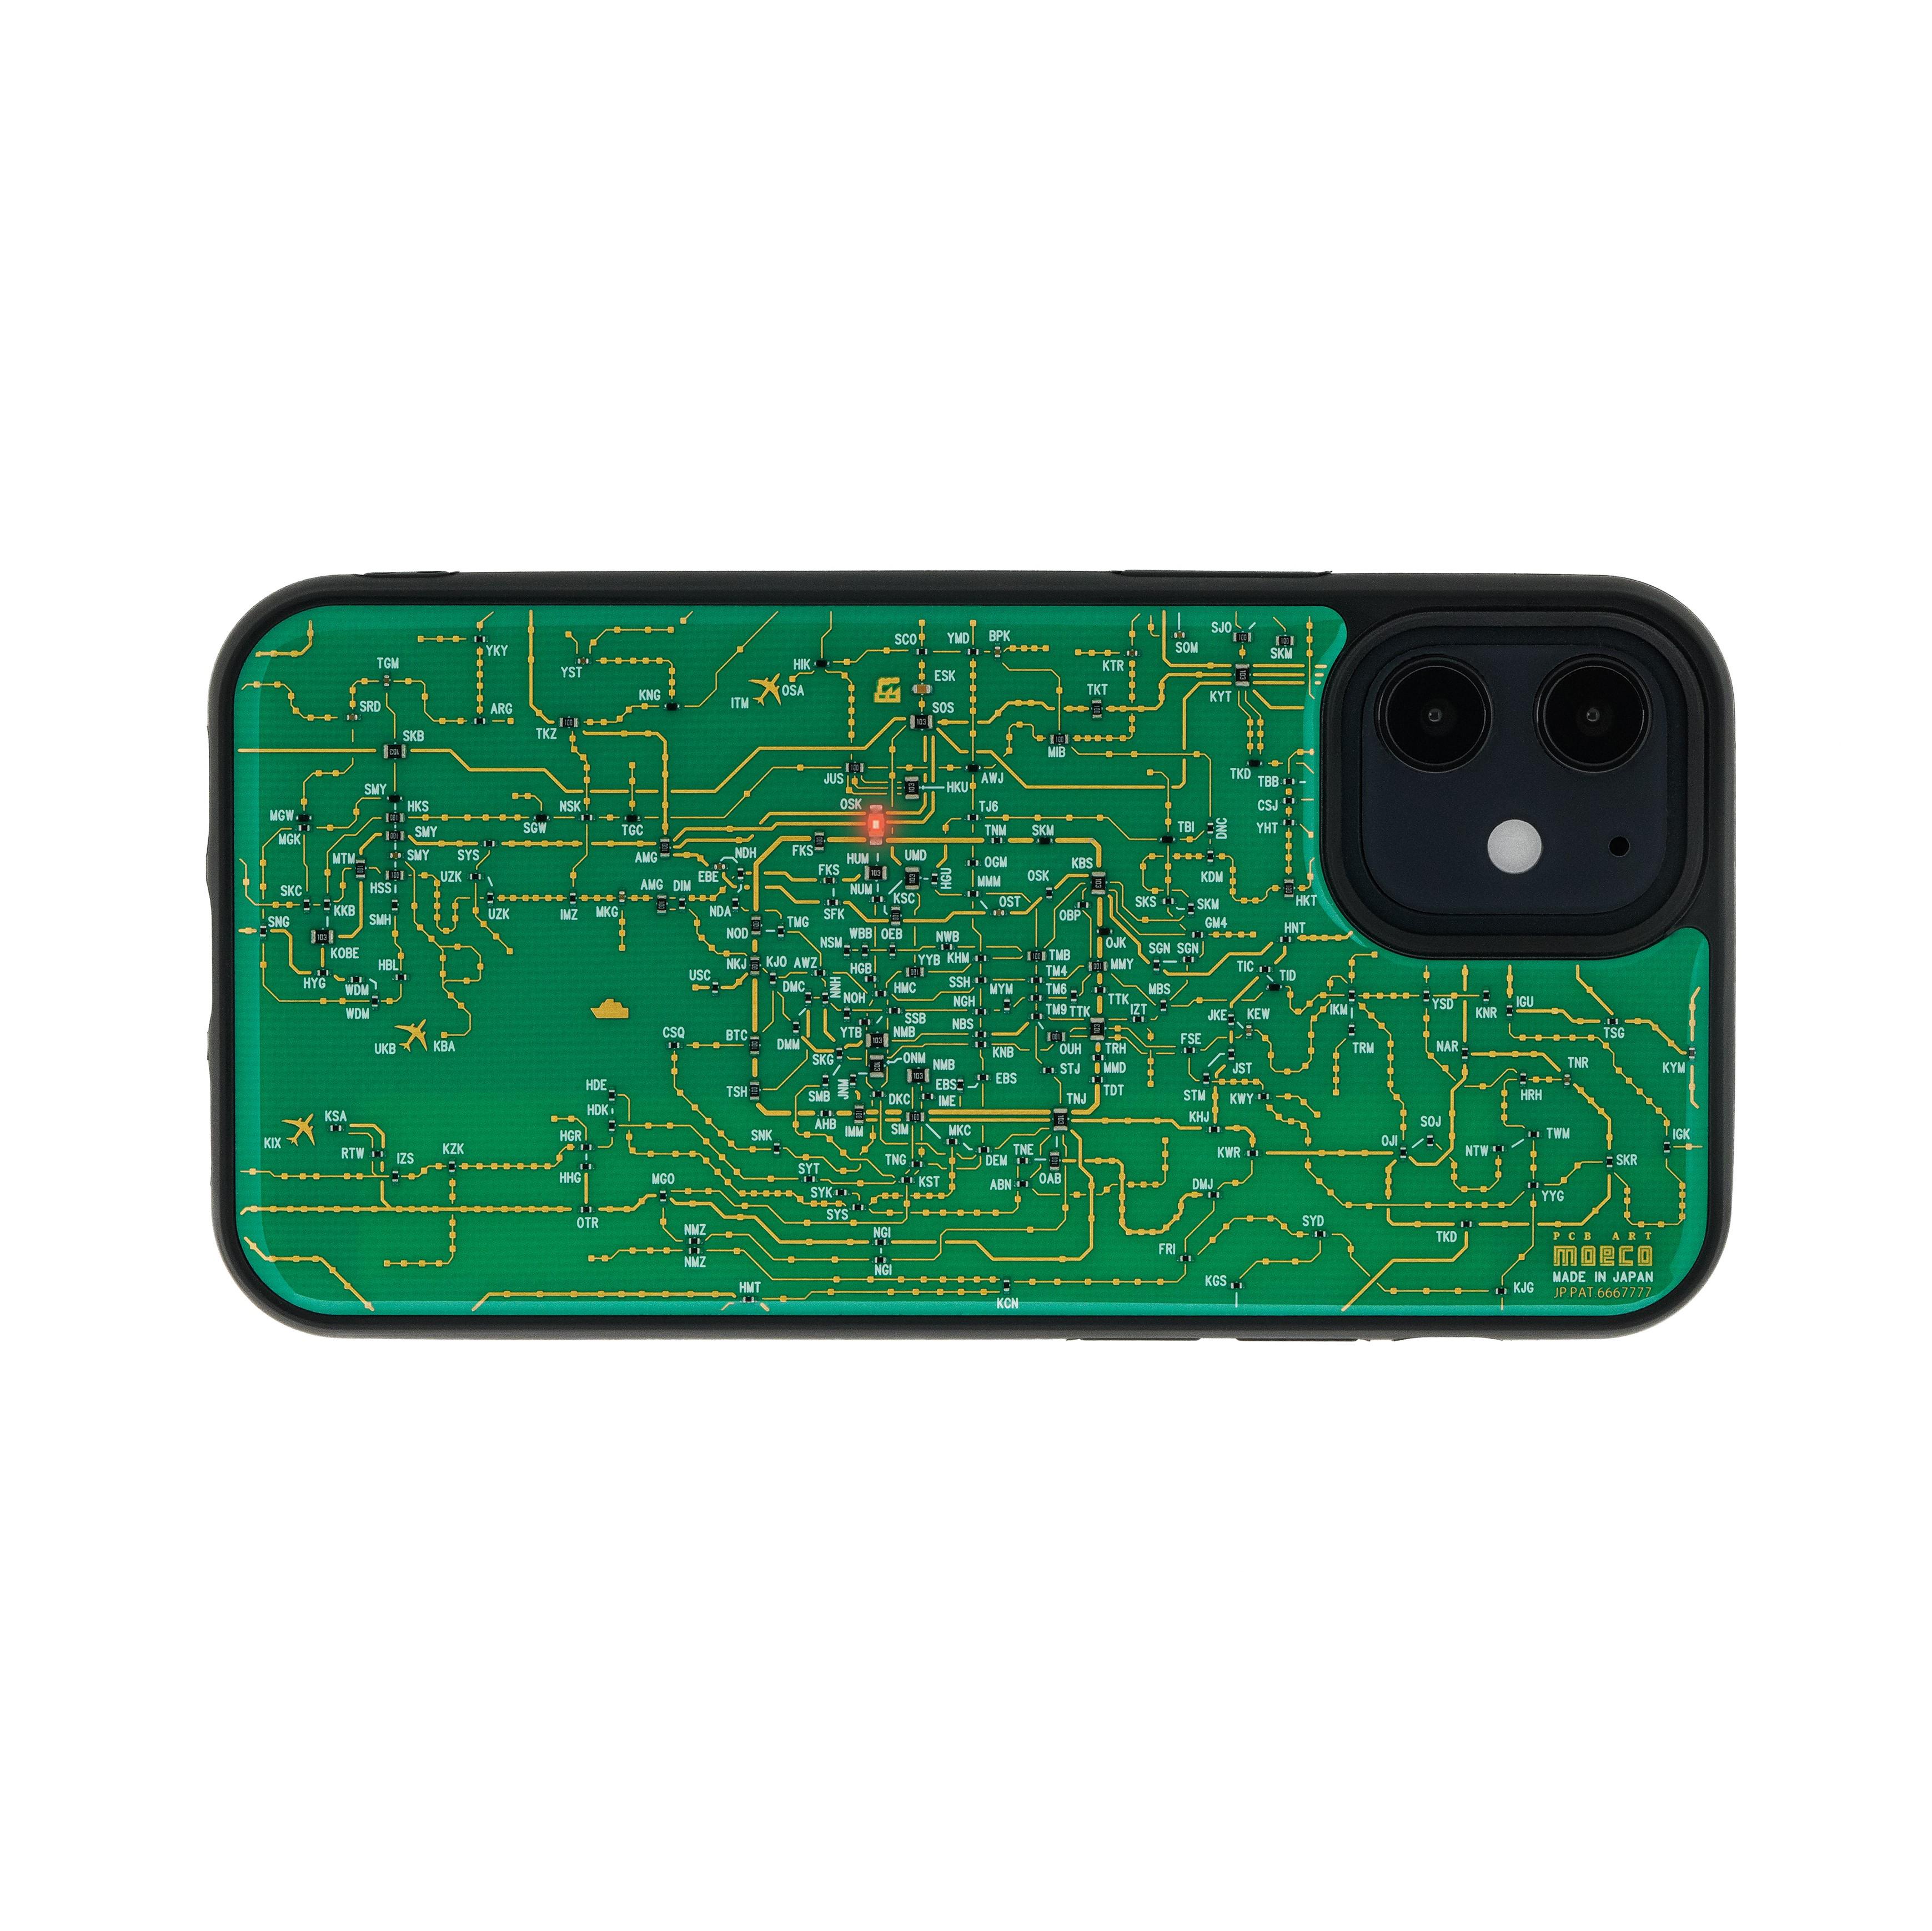 FLASH 関西回路線図 iPhone 12 mini ケース  緑【東京回路線図A5クリアファイルをプレゼント】